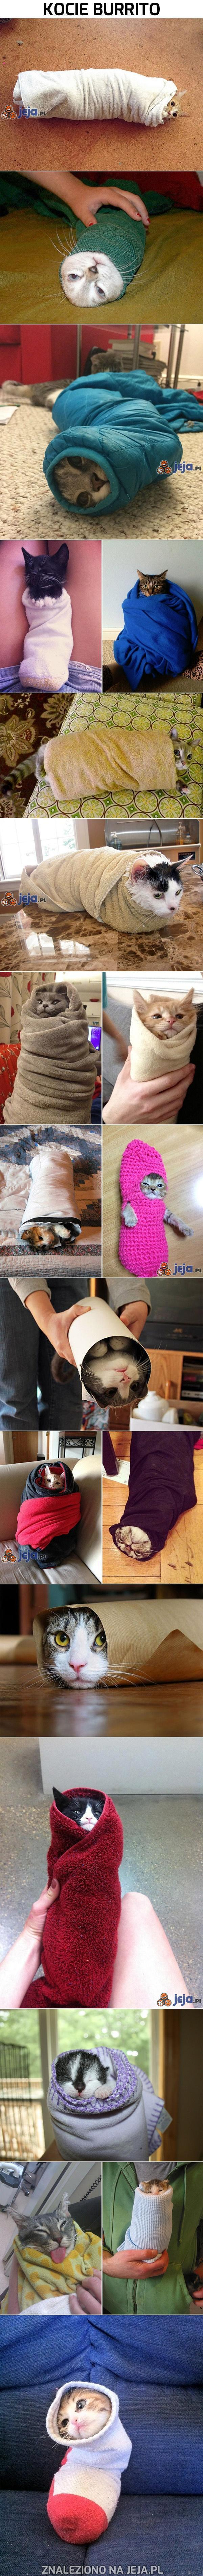 Kocie burrito